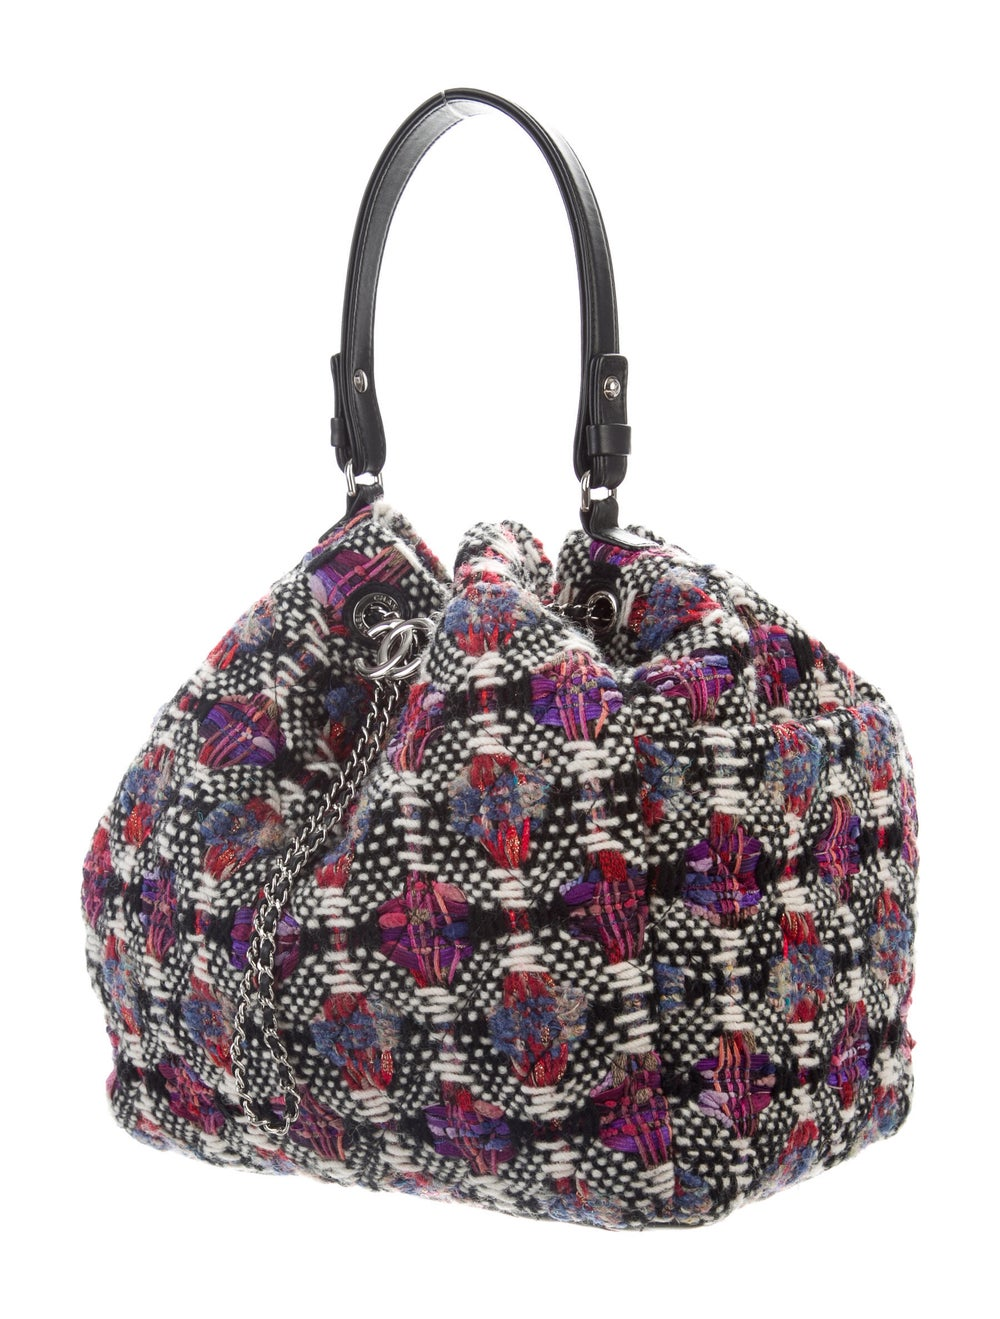 Chanel Tweed Drawstring Bag Cream - image 3